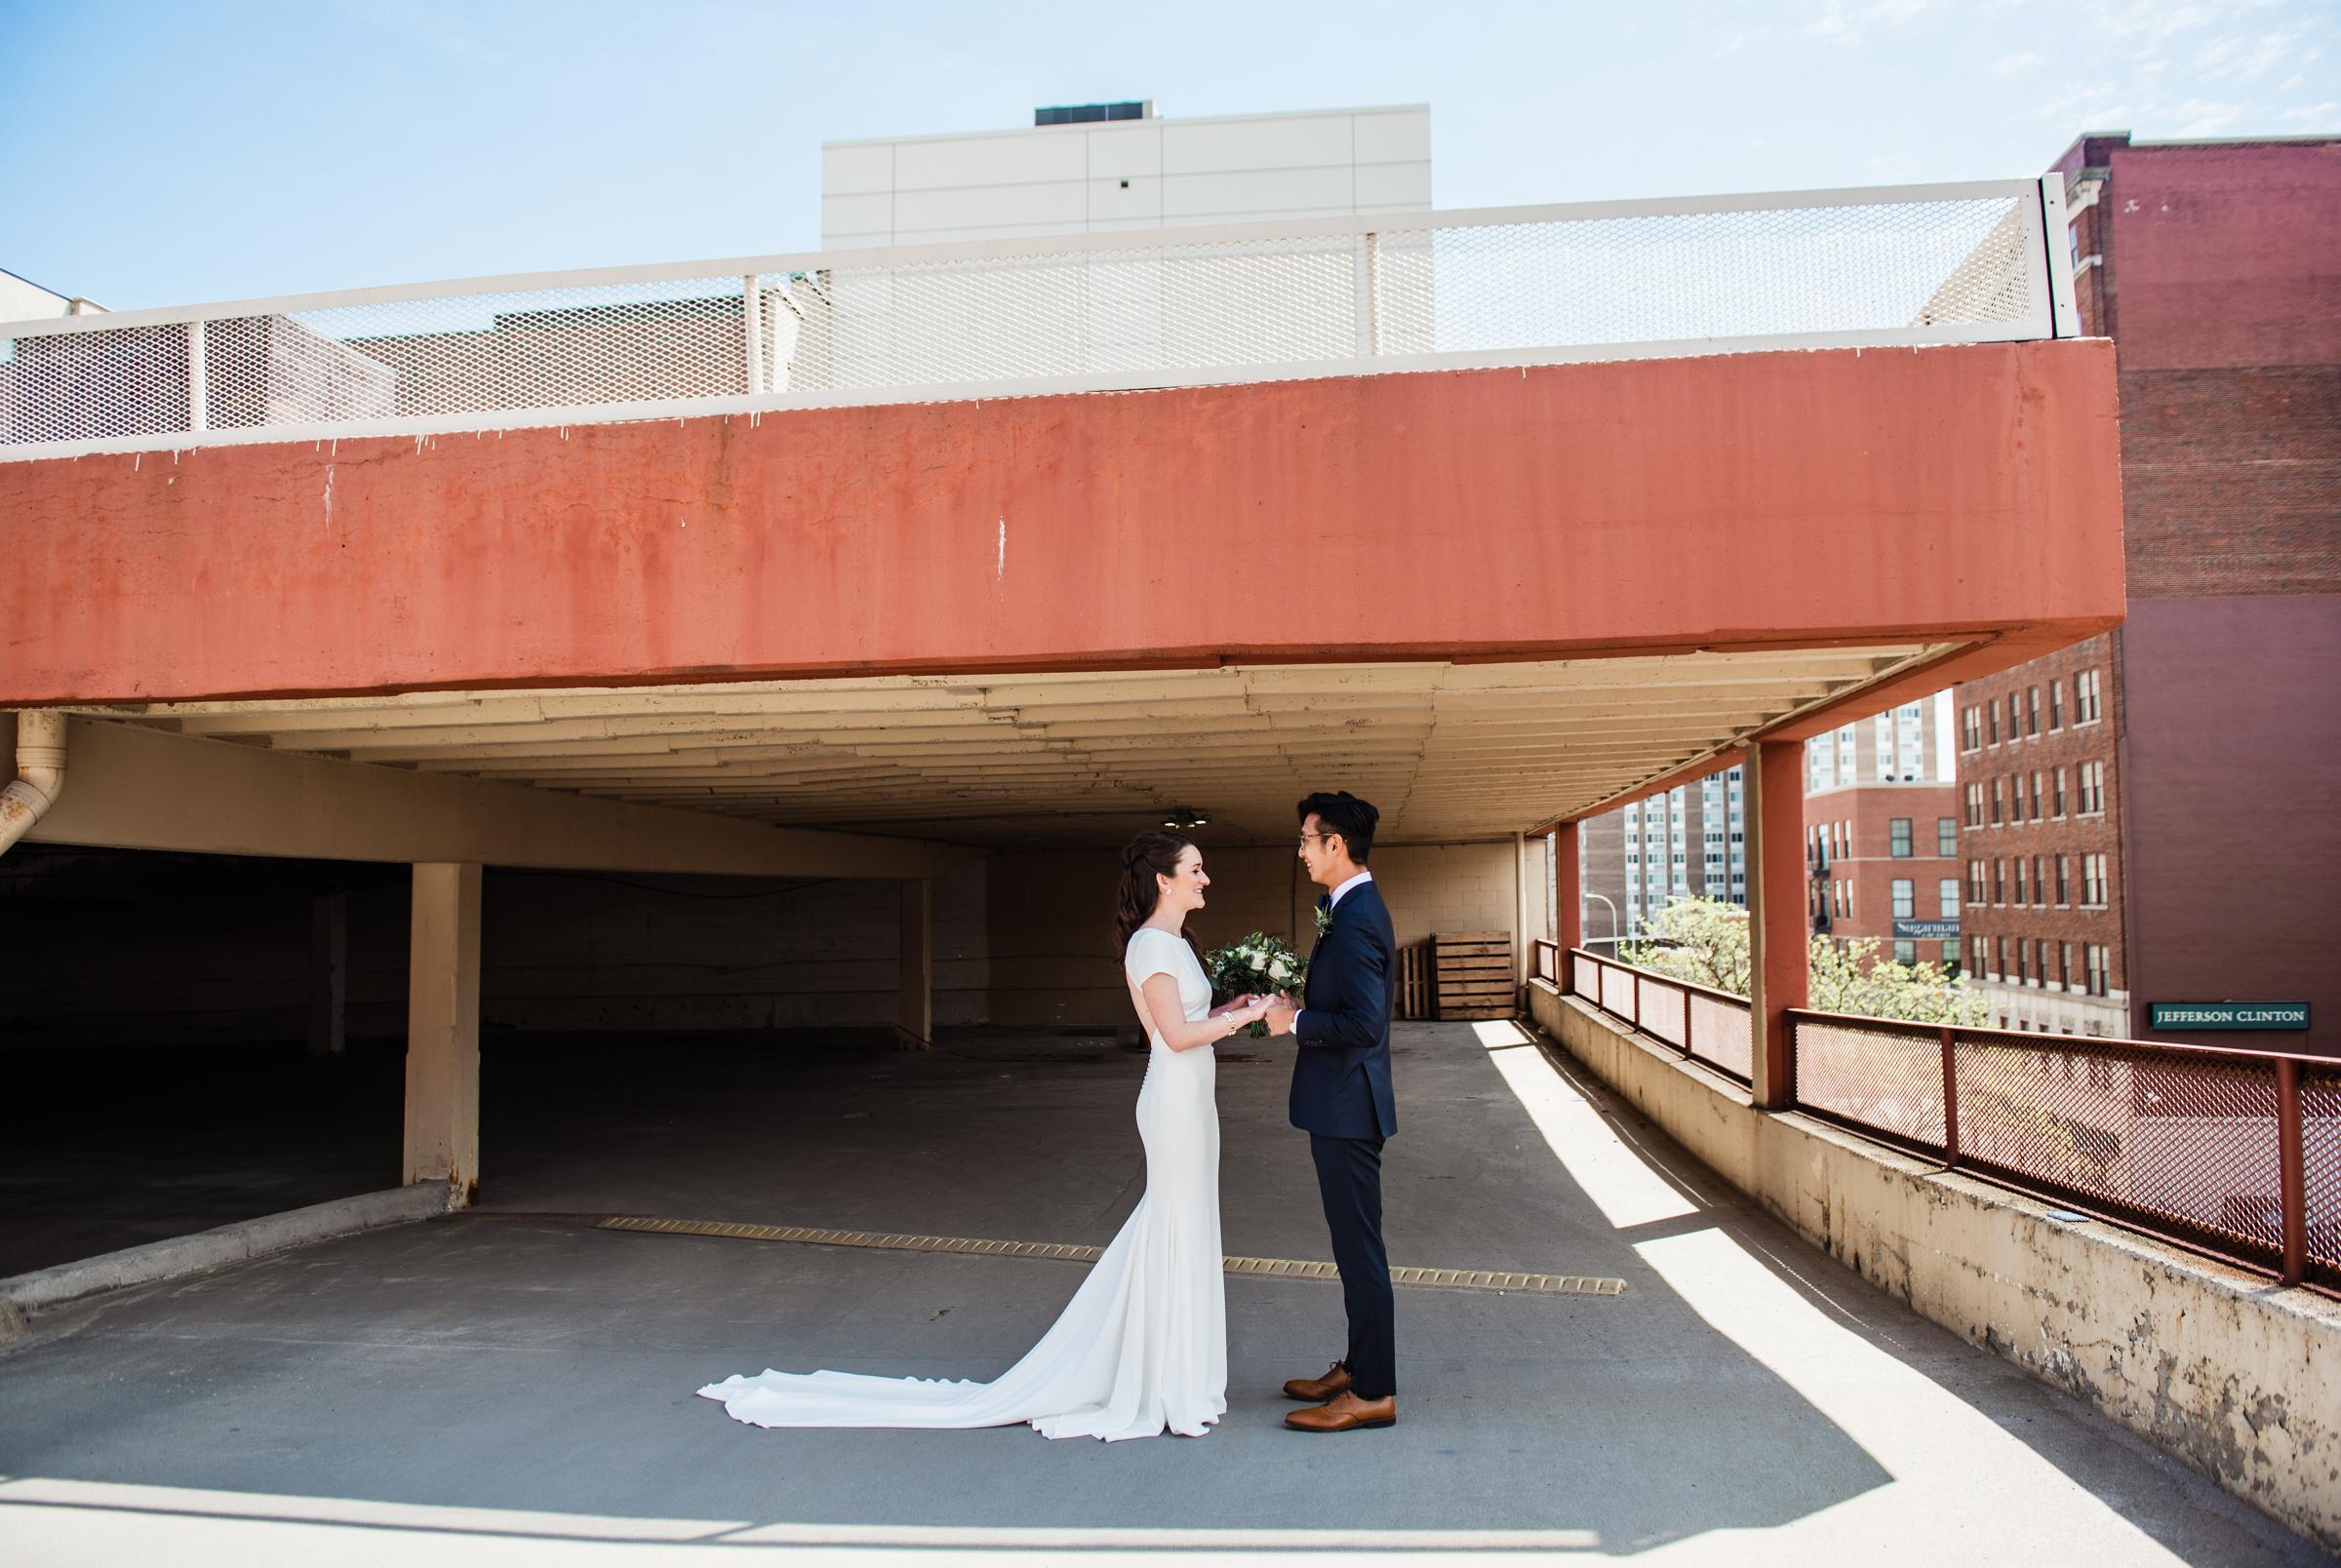 SKY_Armory_Syracuse_Wedding_JILL_STUDIO_Rochester_NY_Photographer_DSC_5211.jpg